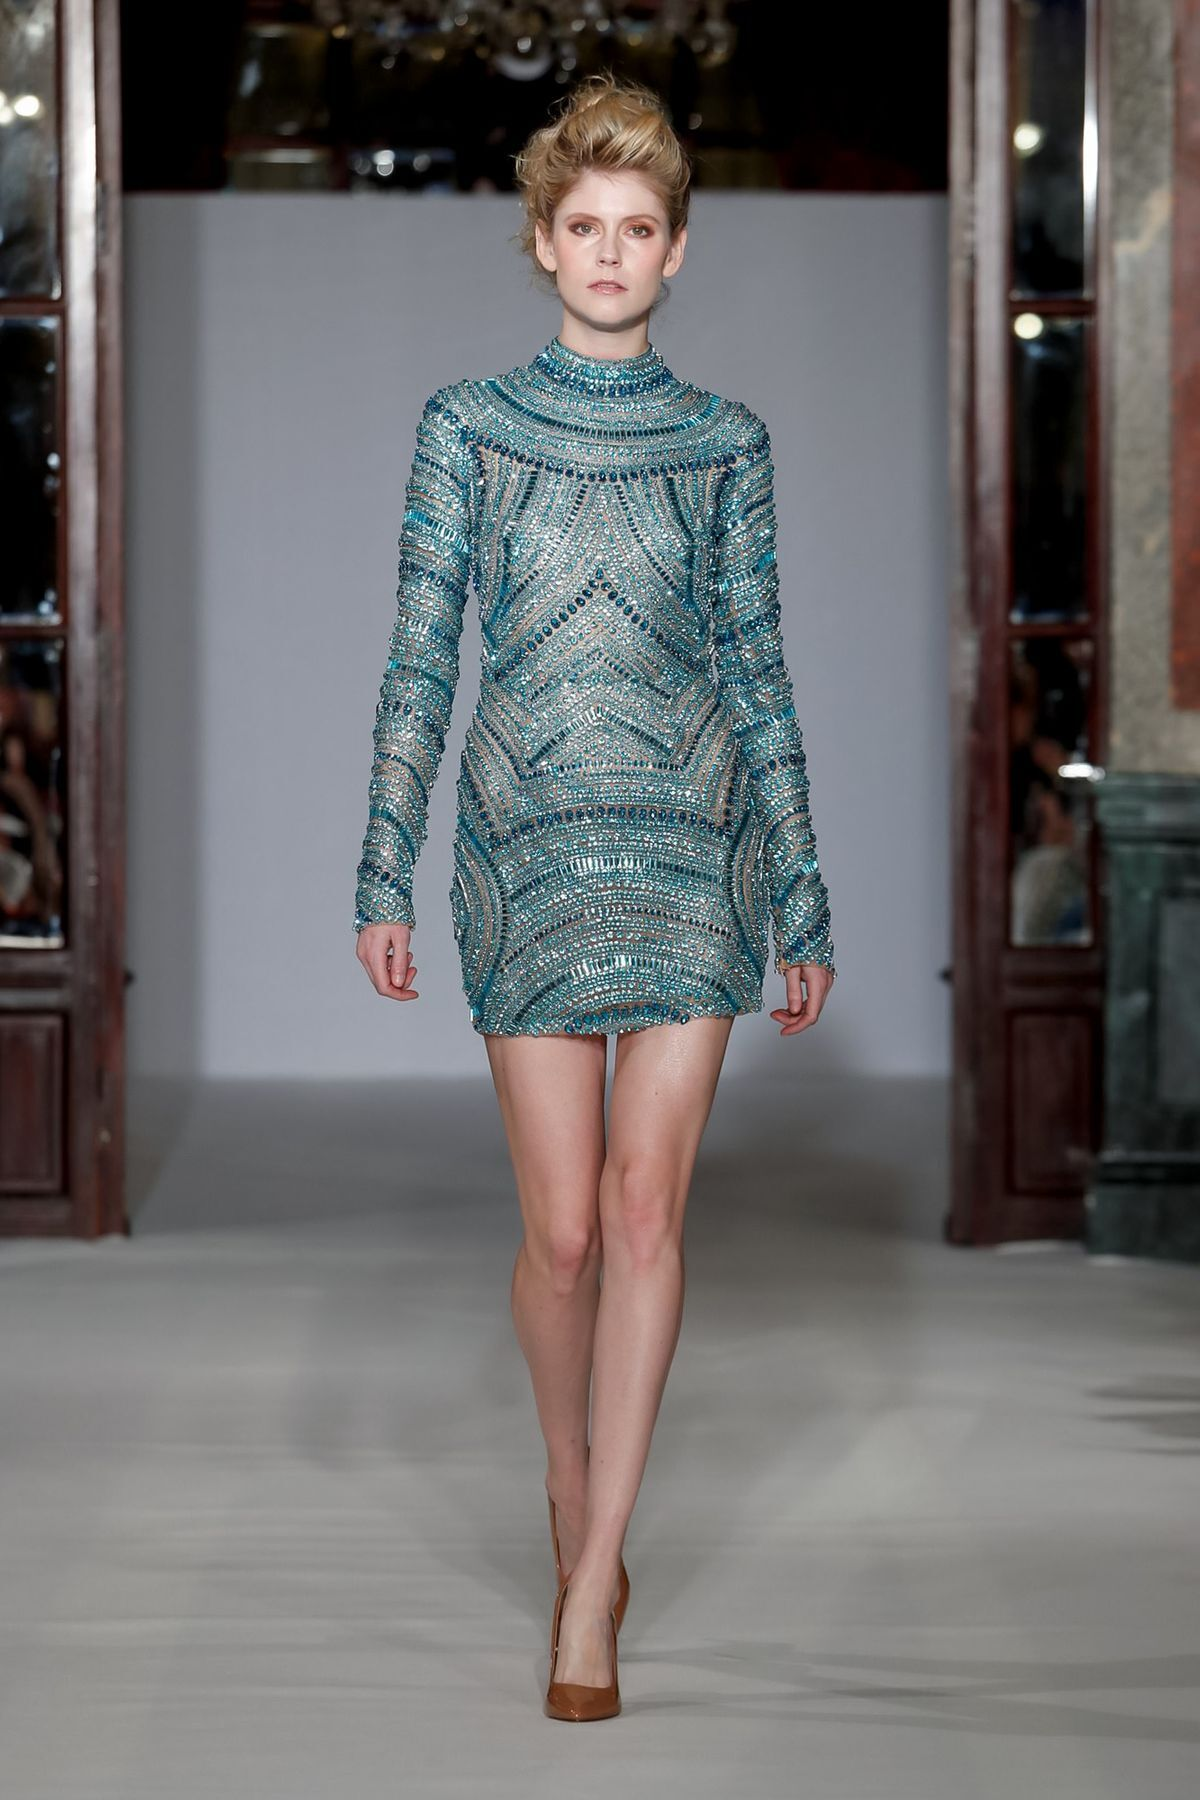 Alin le' kal ss19 paris fashion week 2019